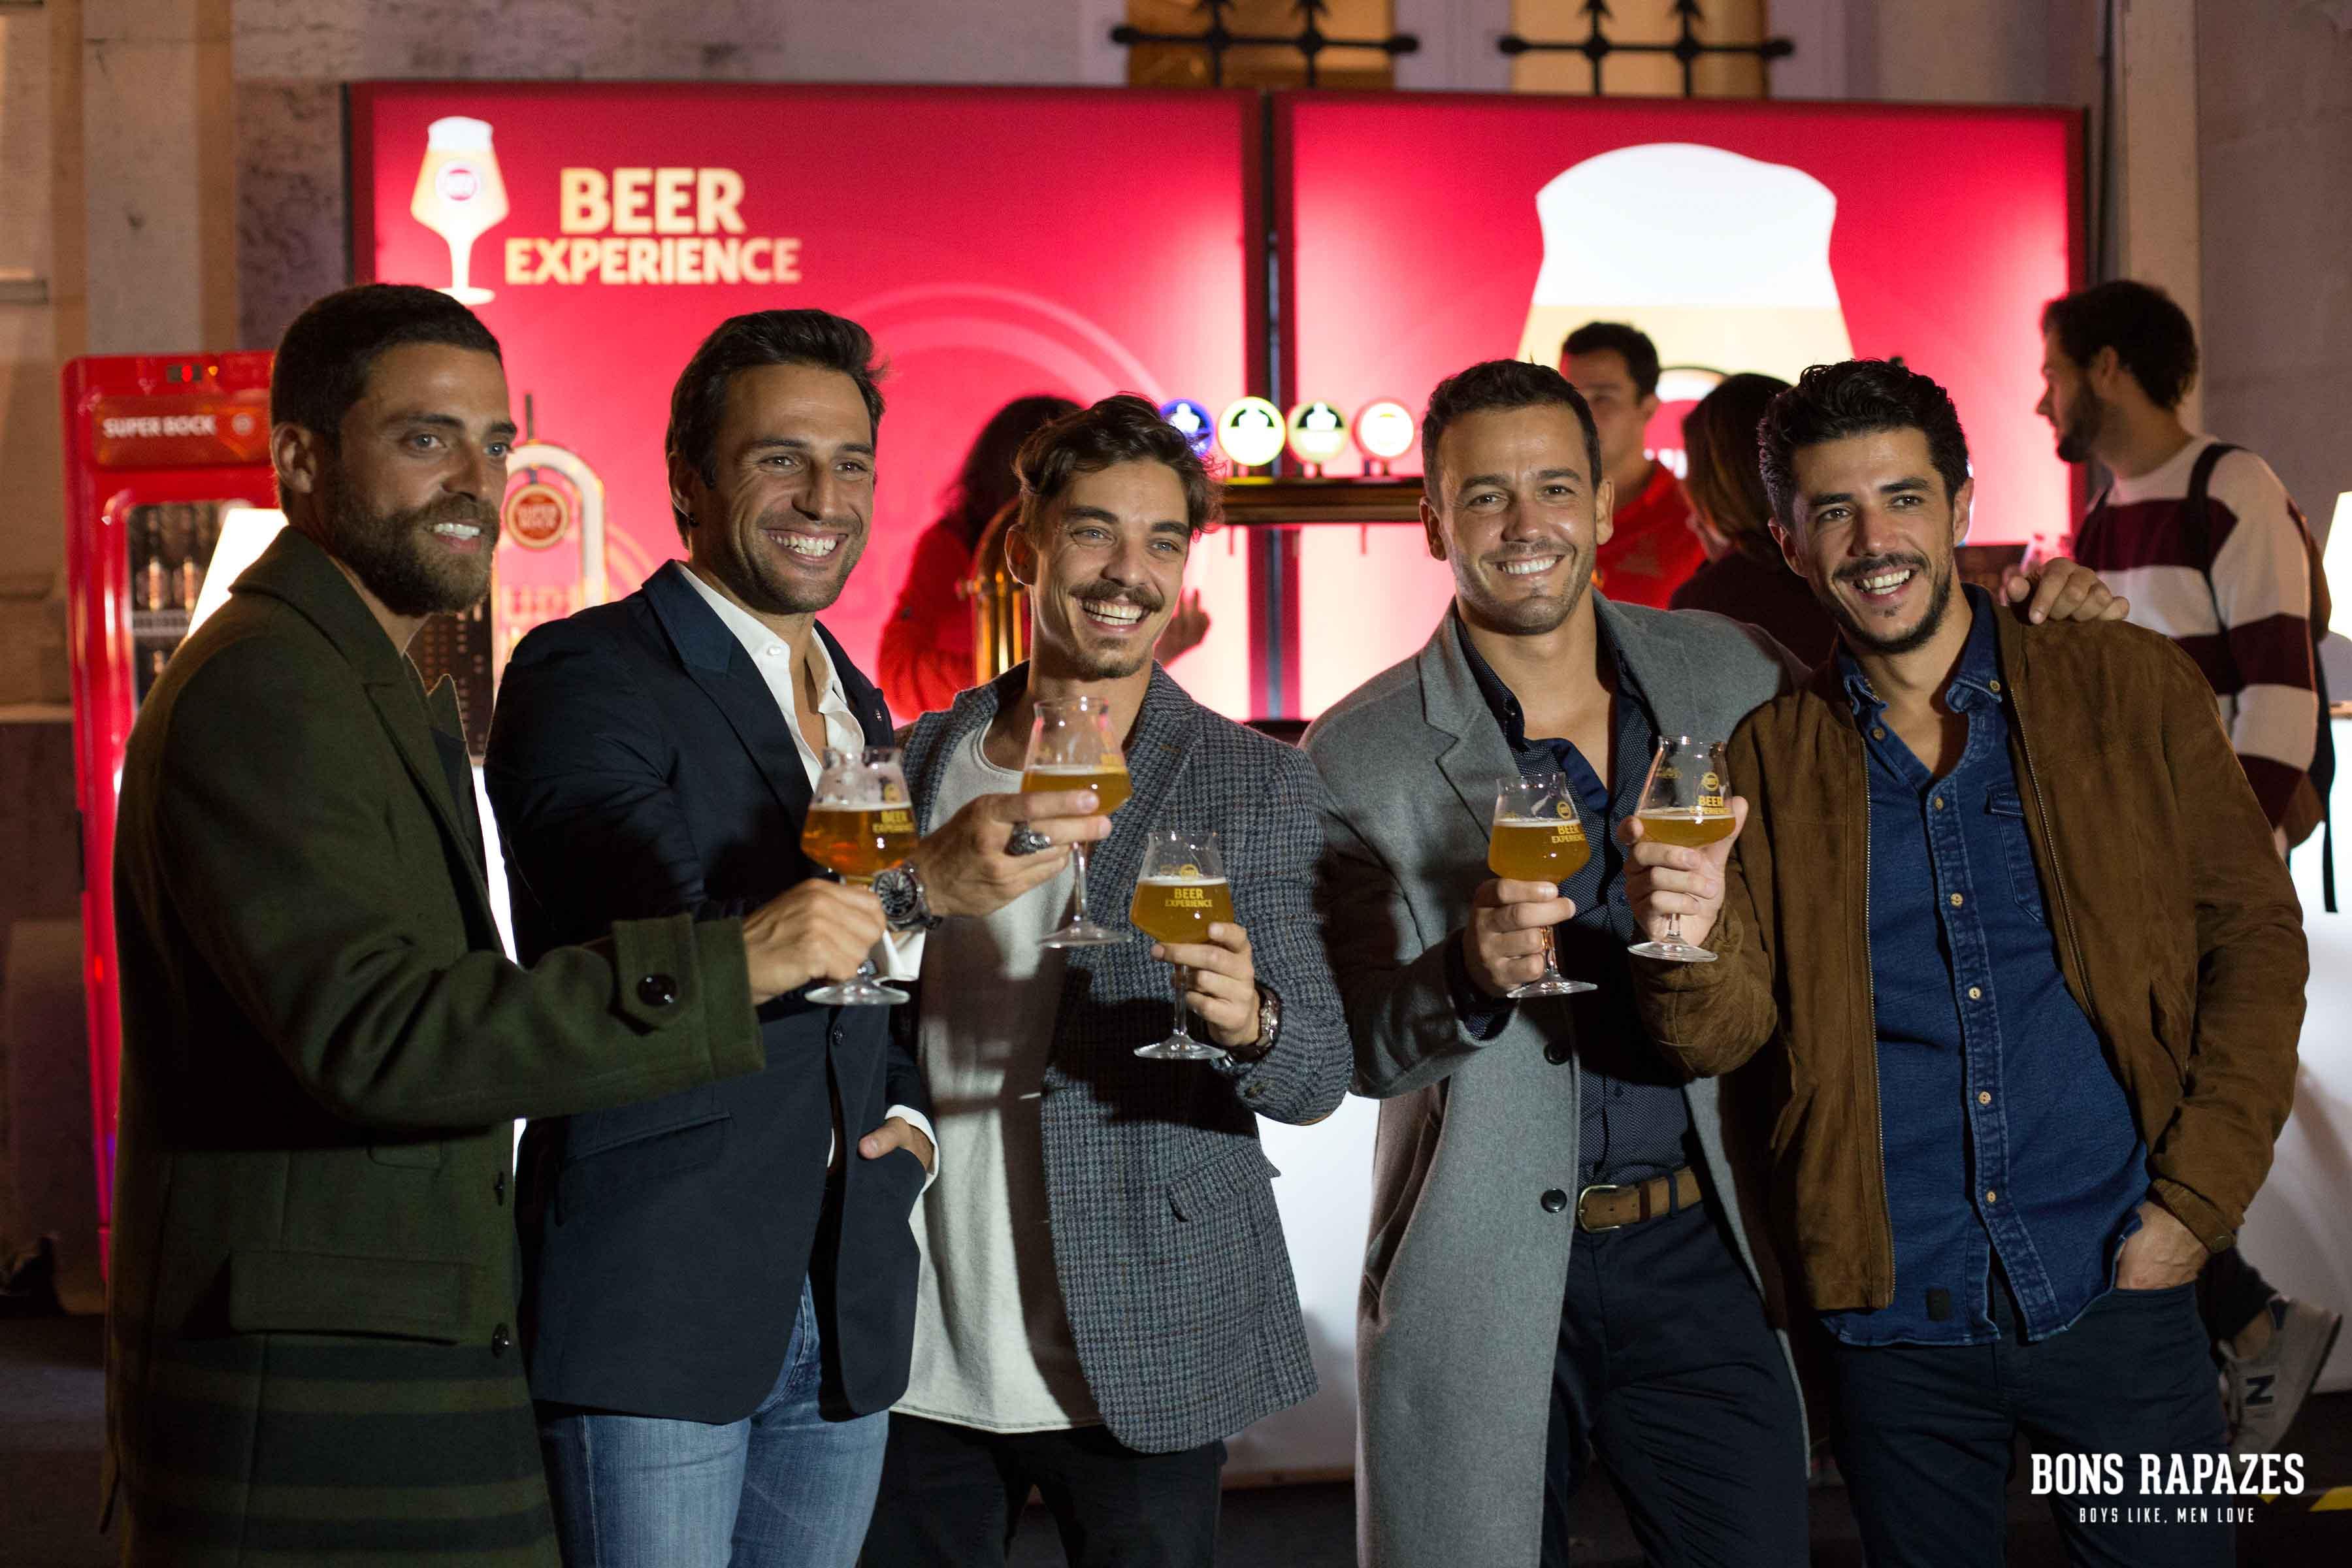 bons-rapazes-super-bock-beer-experience-6